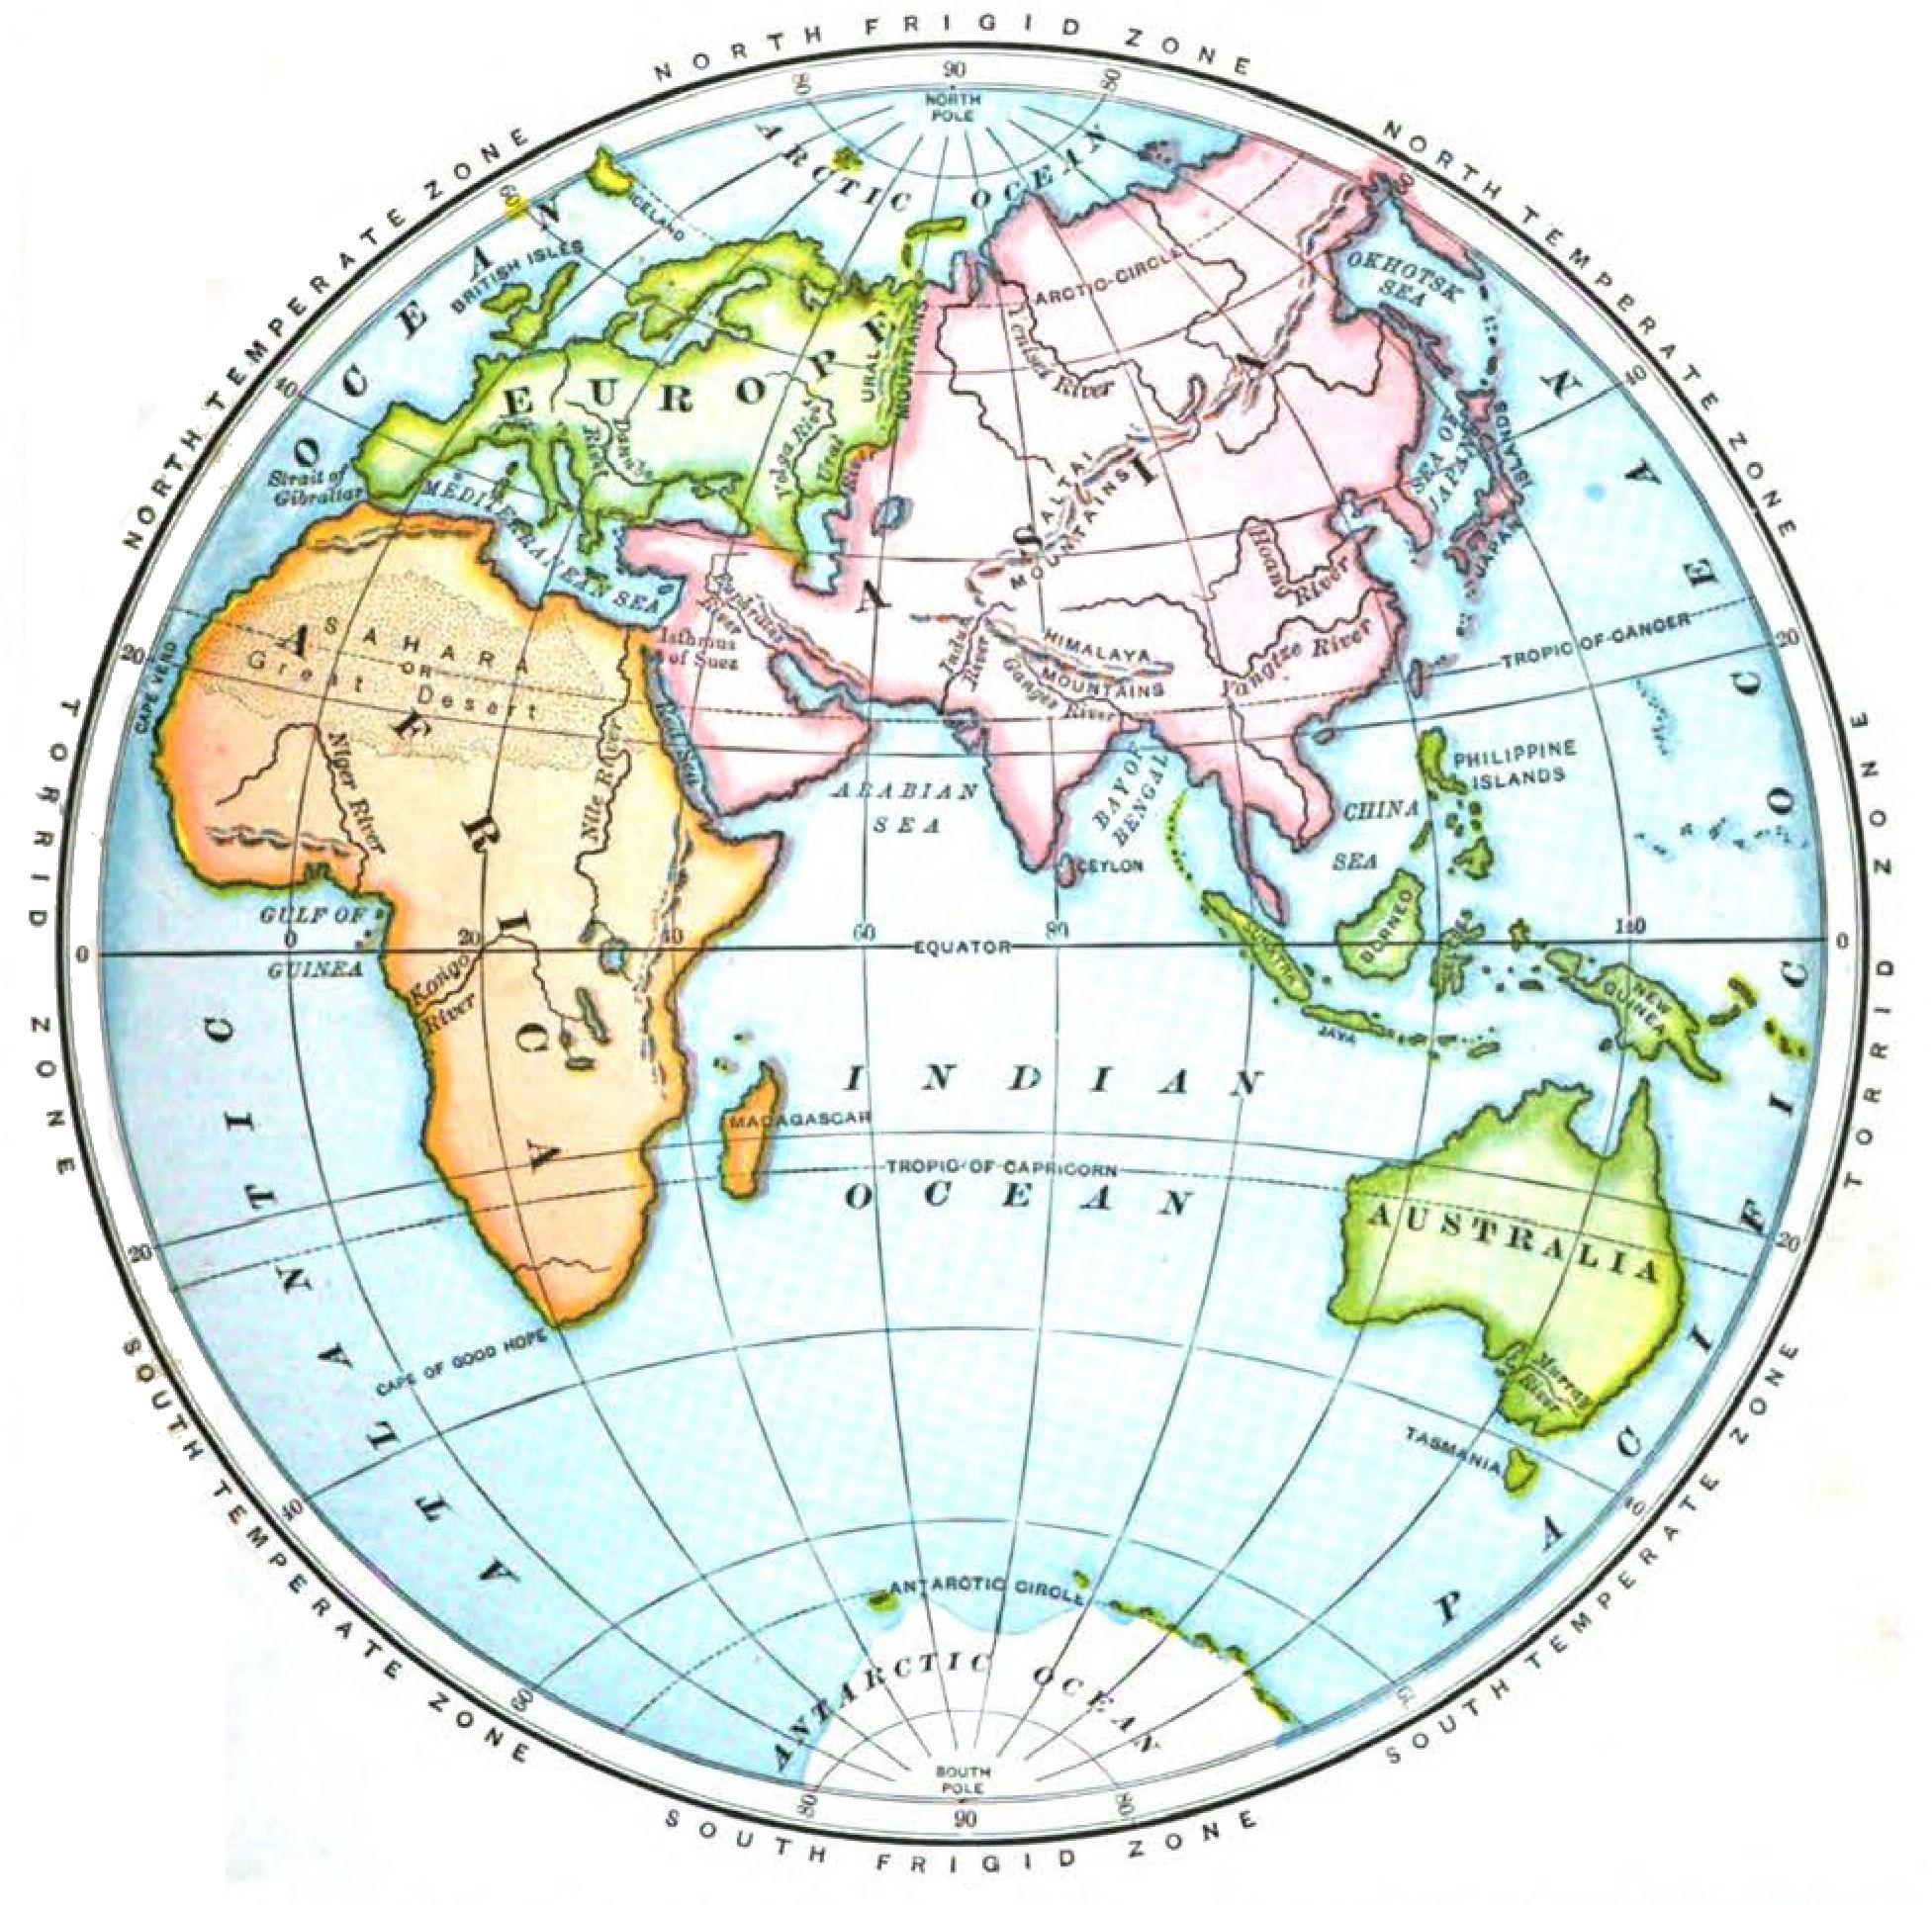 File:Maury Geography 029A Eastern Hemisphere.jpg